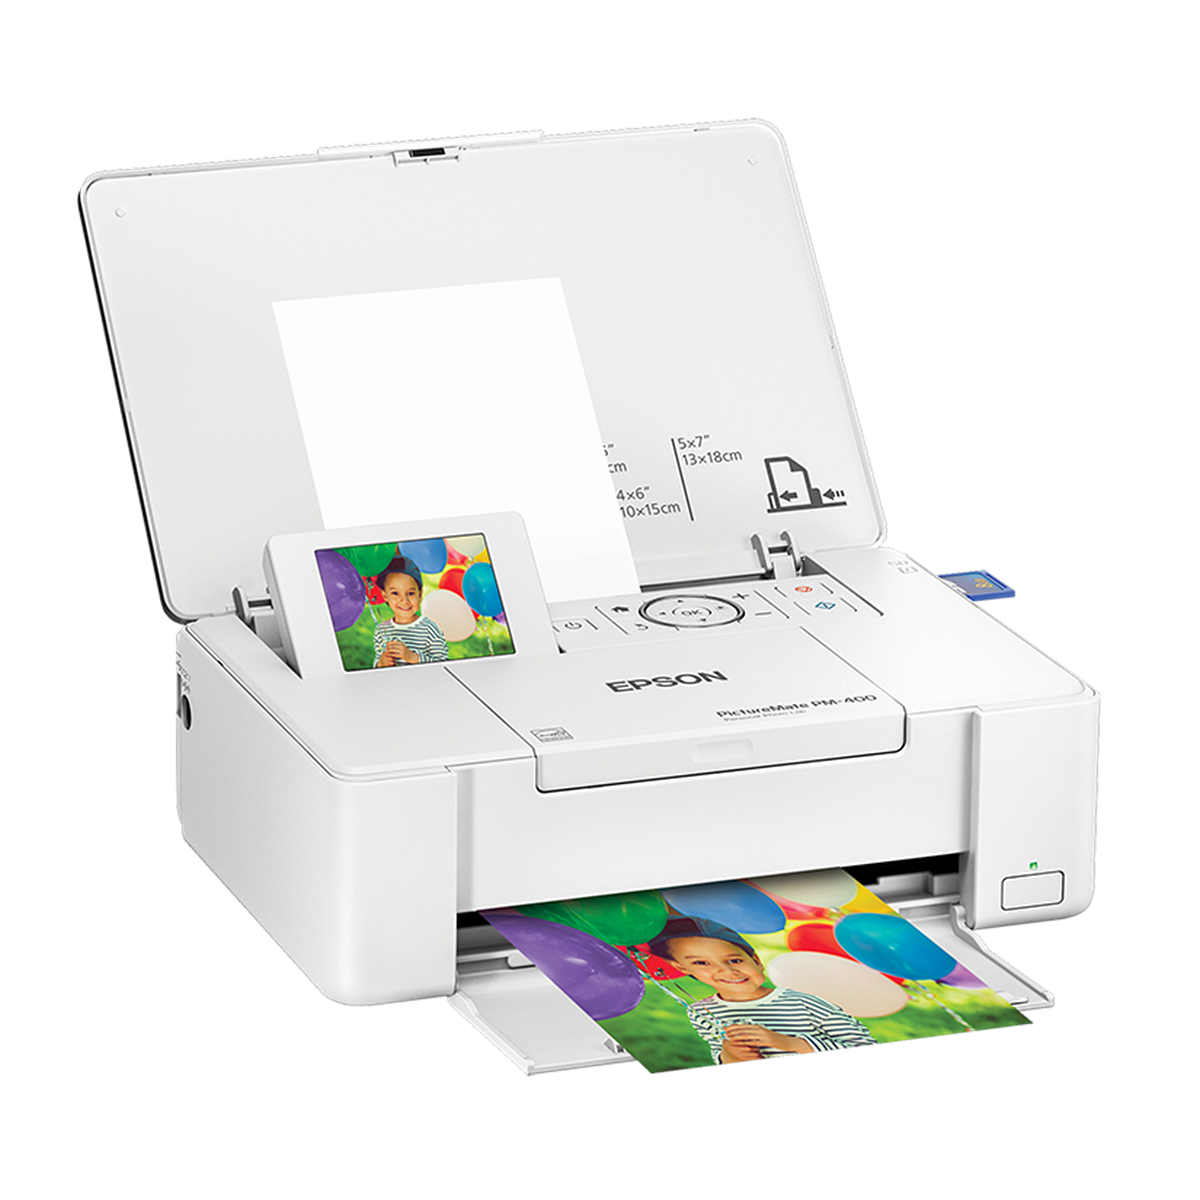 Epson introduces Wi-Fi Direct PictureMate PM-400 mini-inkjet